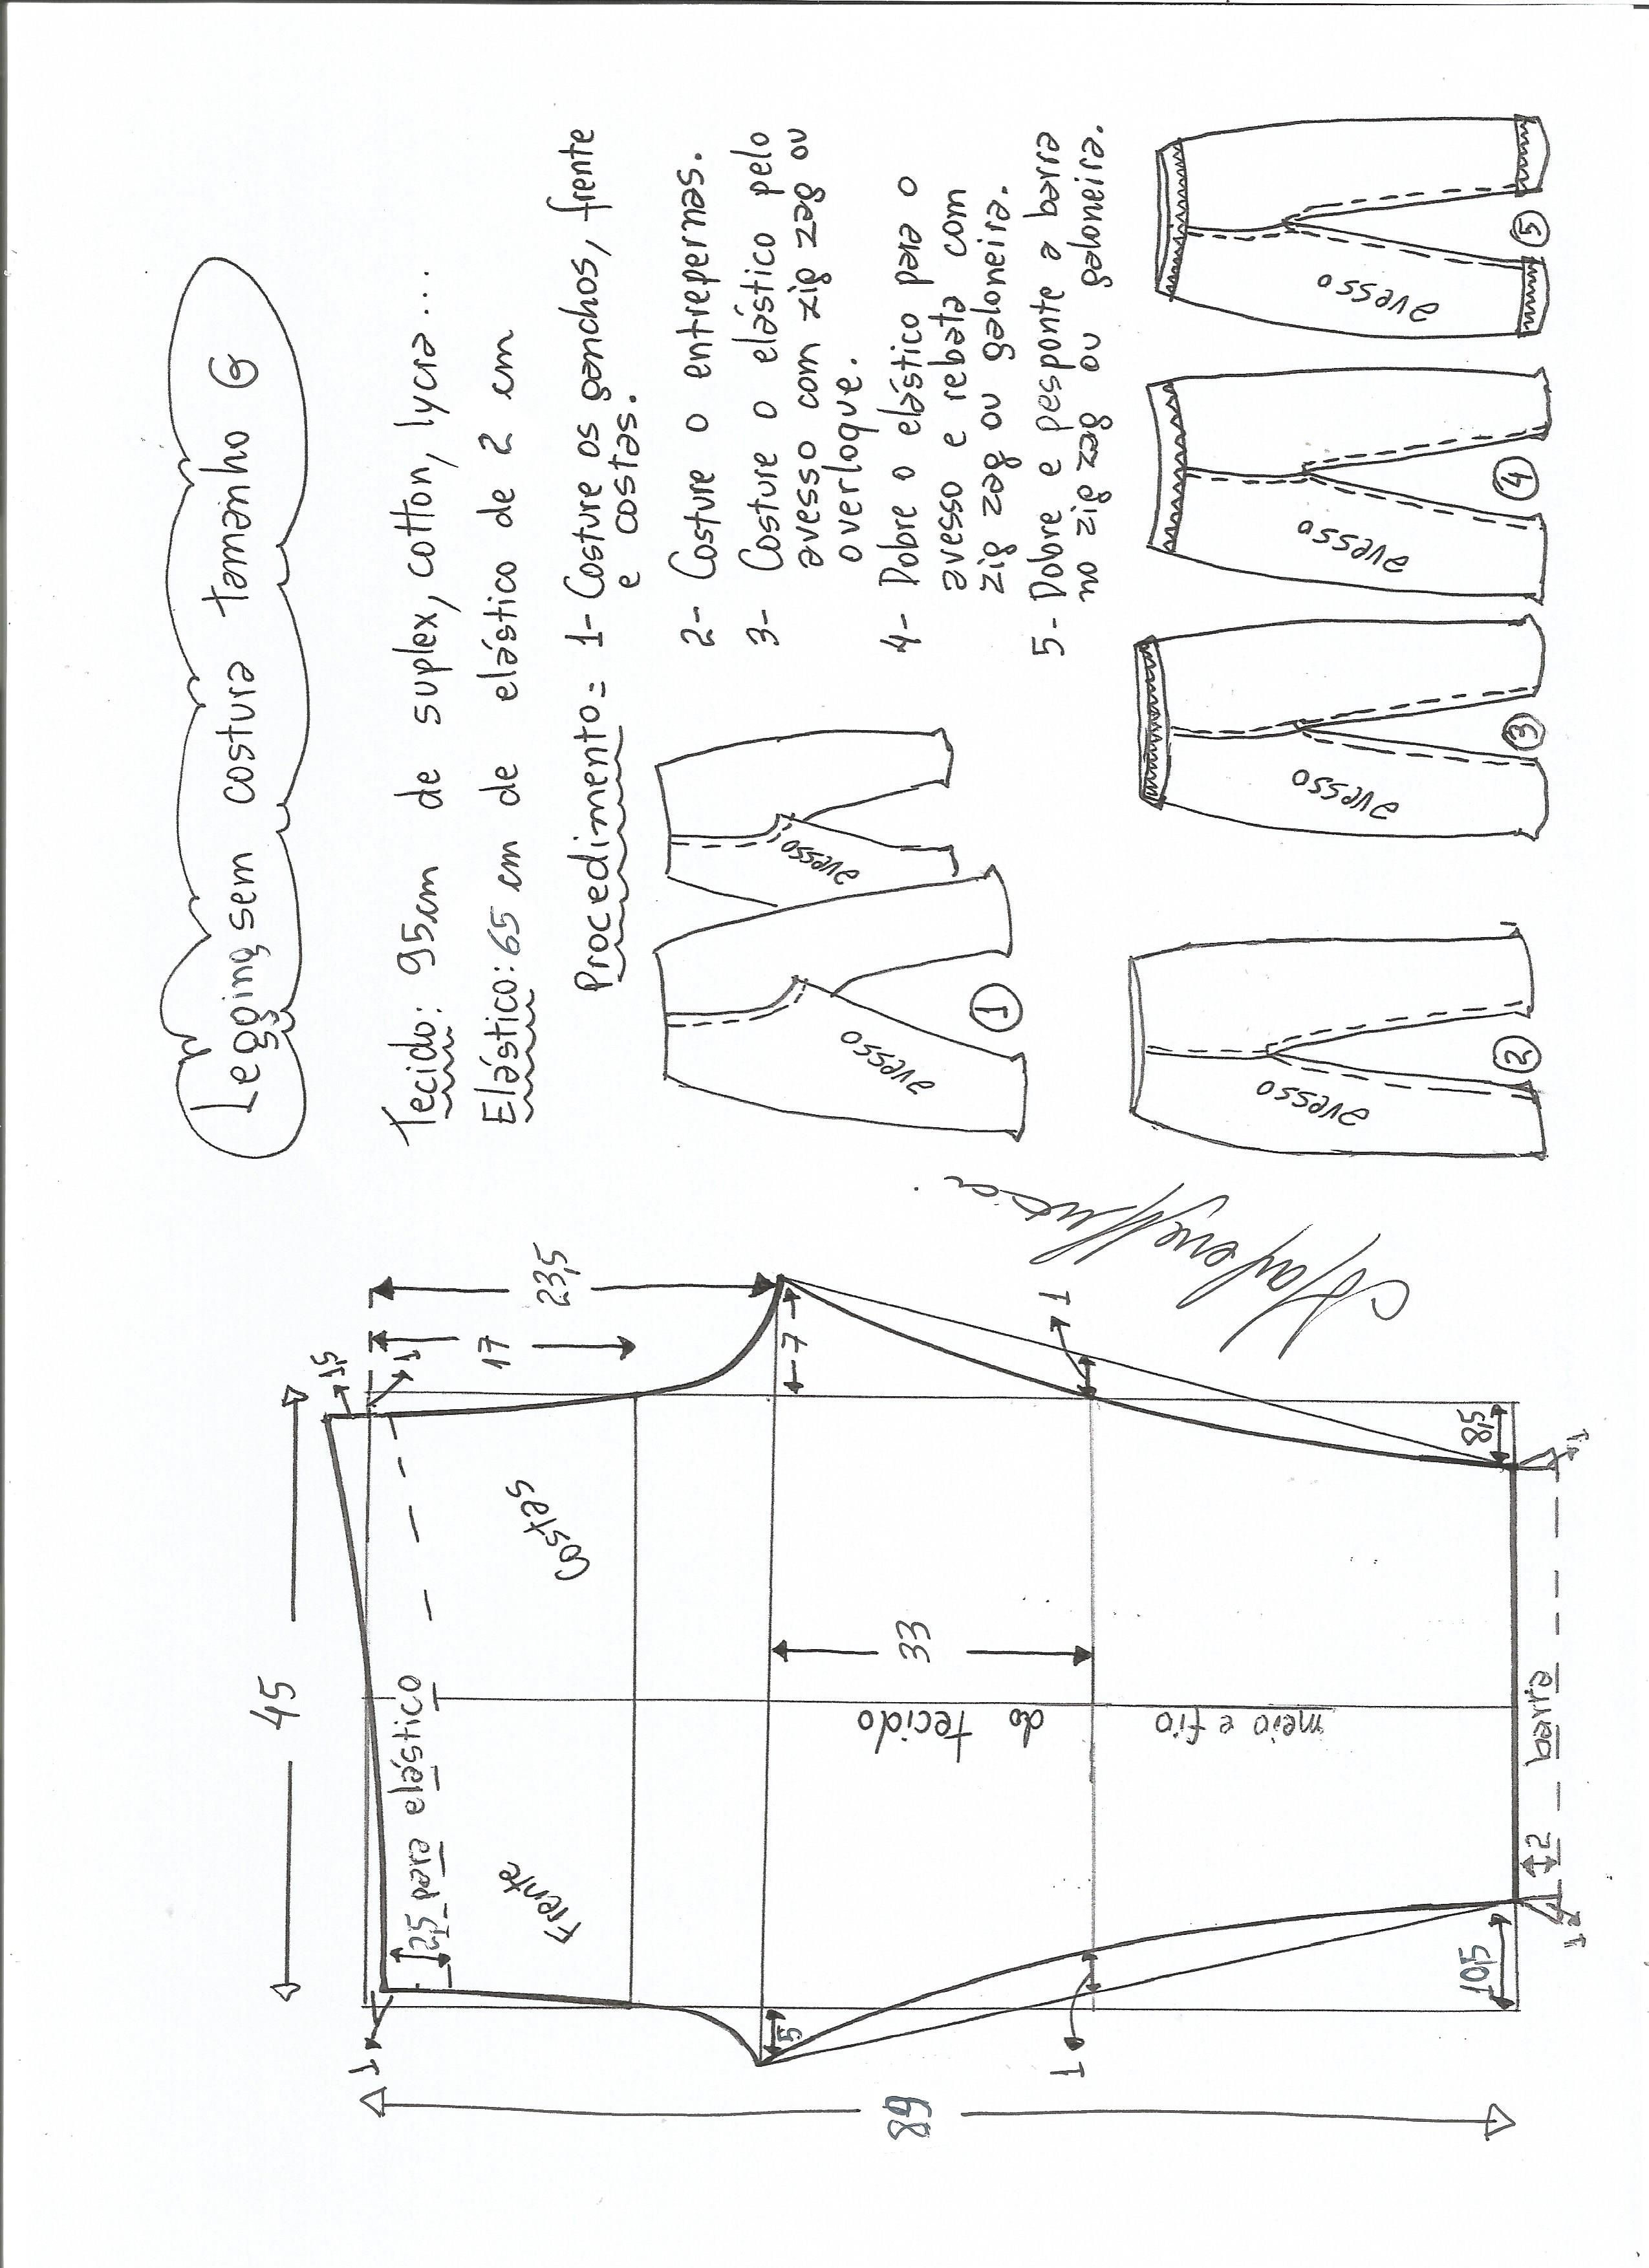 Pin de hely ferreira en calça | Pinterest | Costura, Molde y Patrones